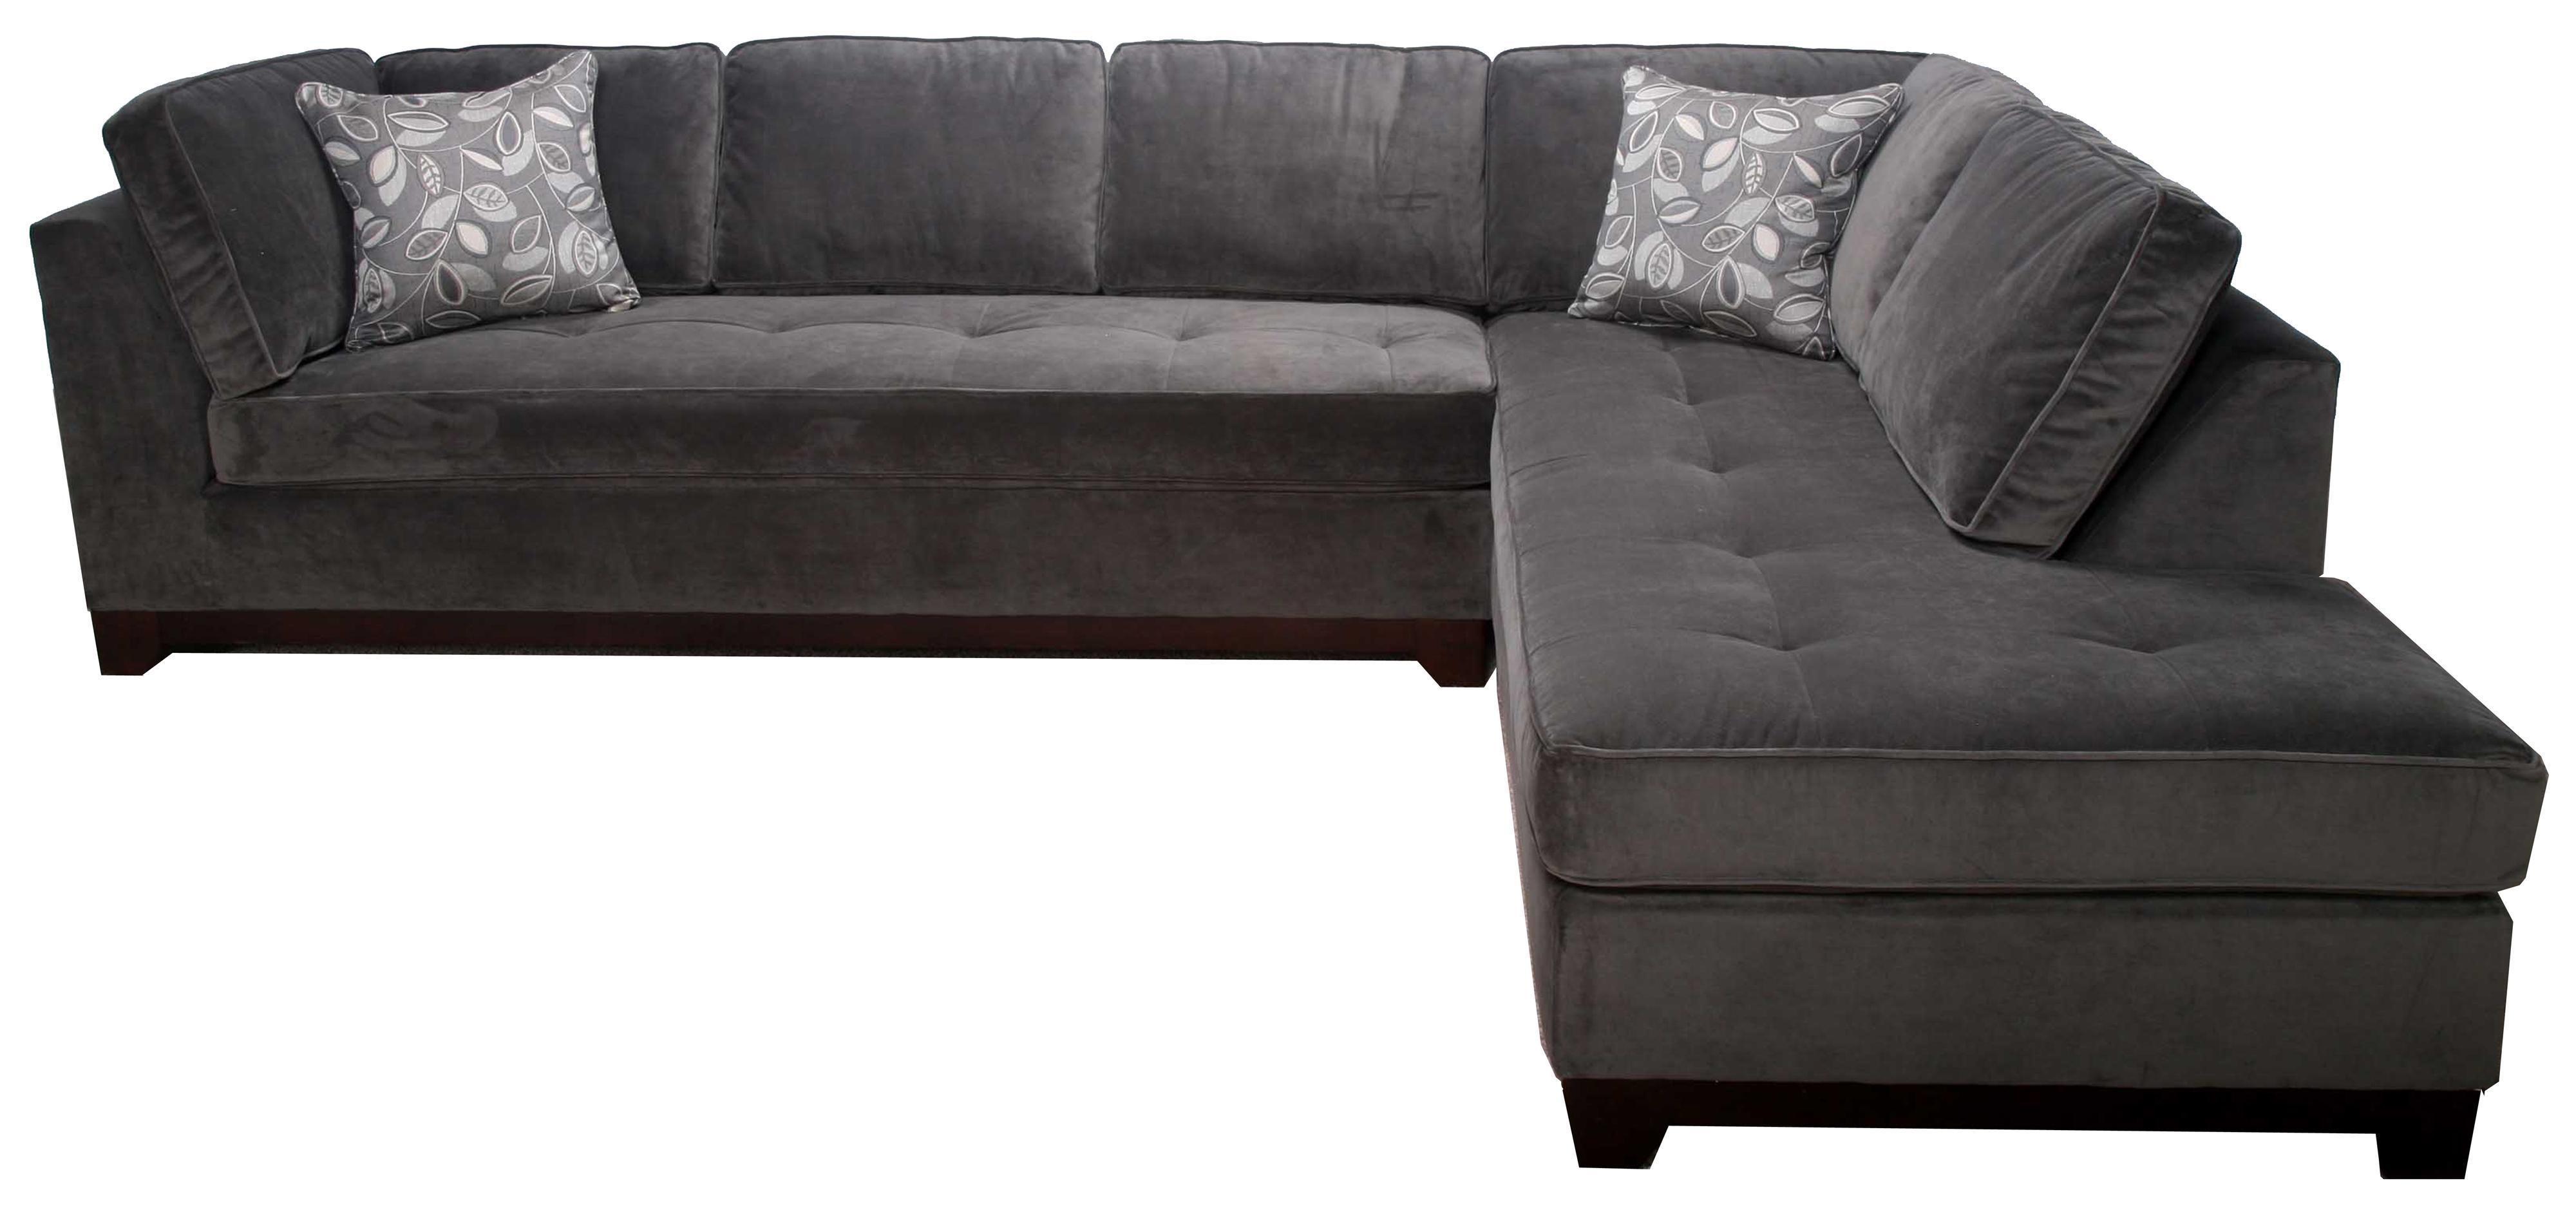 20 best collection of bauhaus furniture sectional sofas. Black Bedroom Furniture Sets. Home Design Ideas